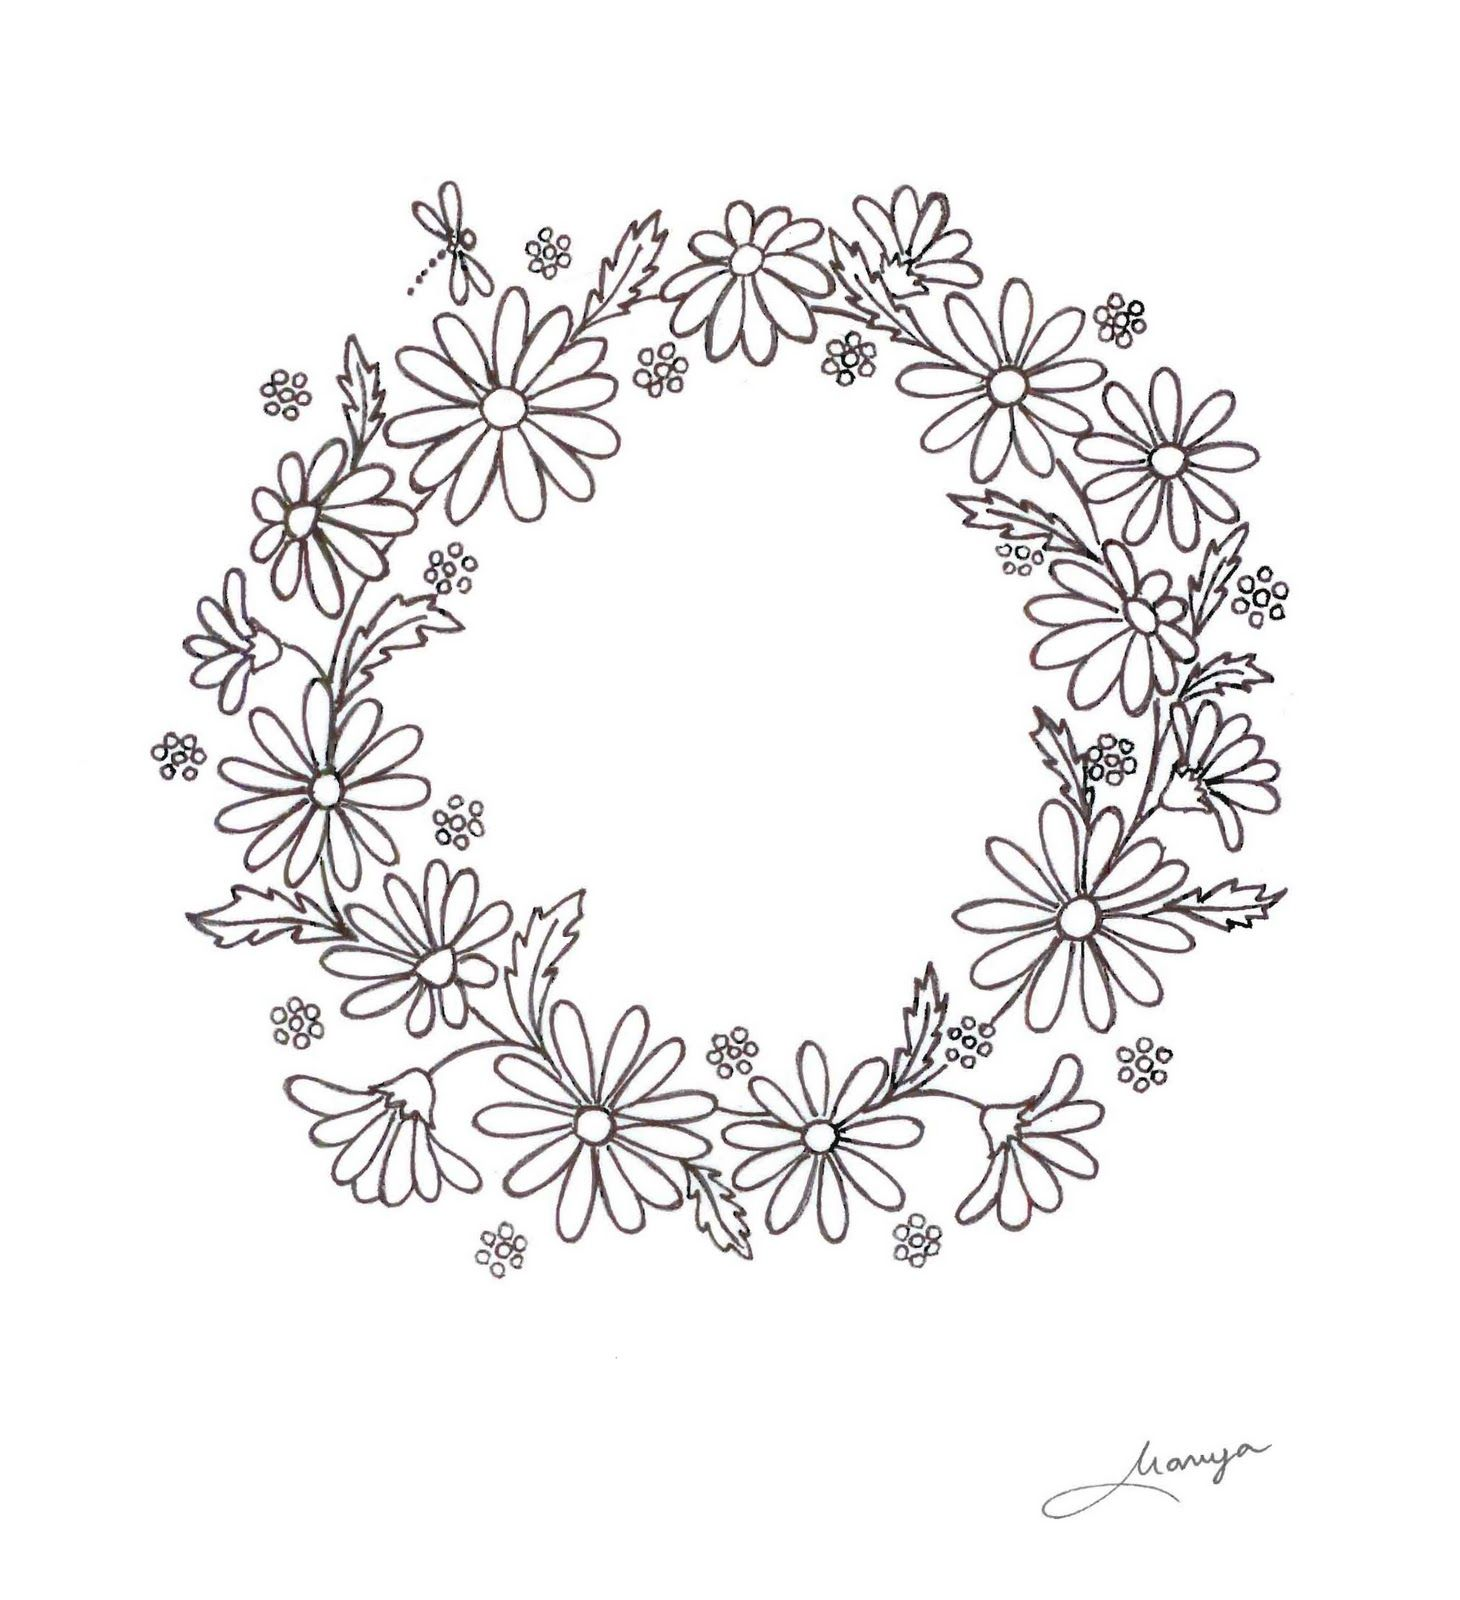 Humming needles daisy wreath design moldes pinterest wreaths